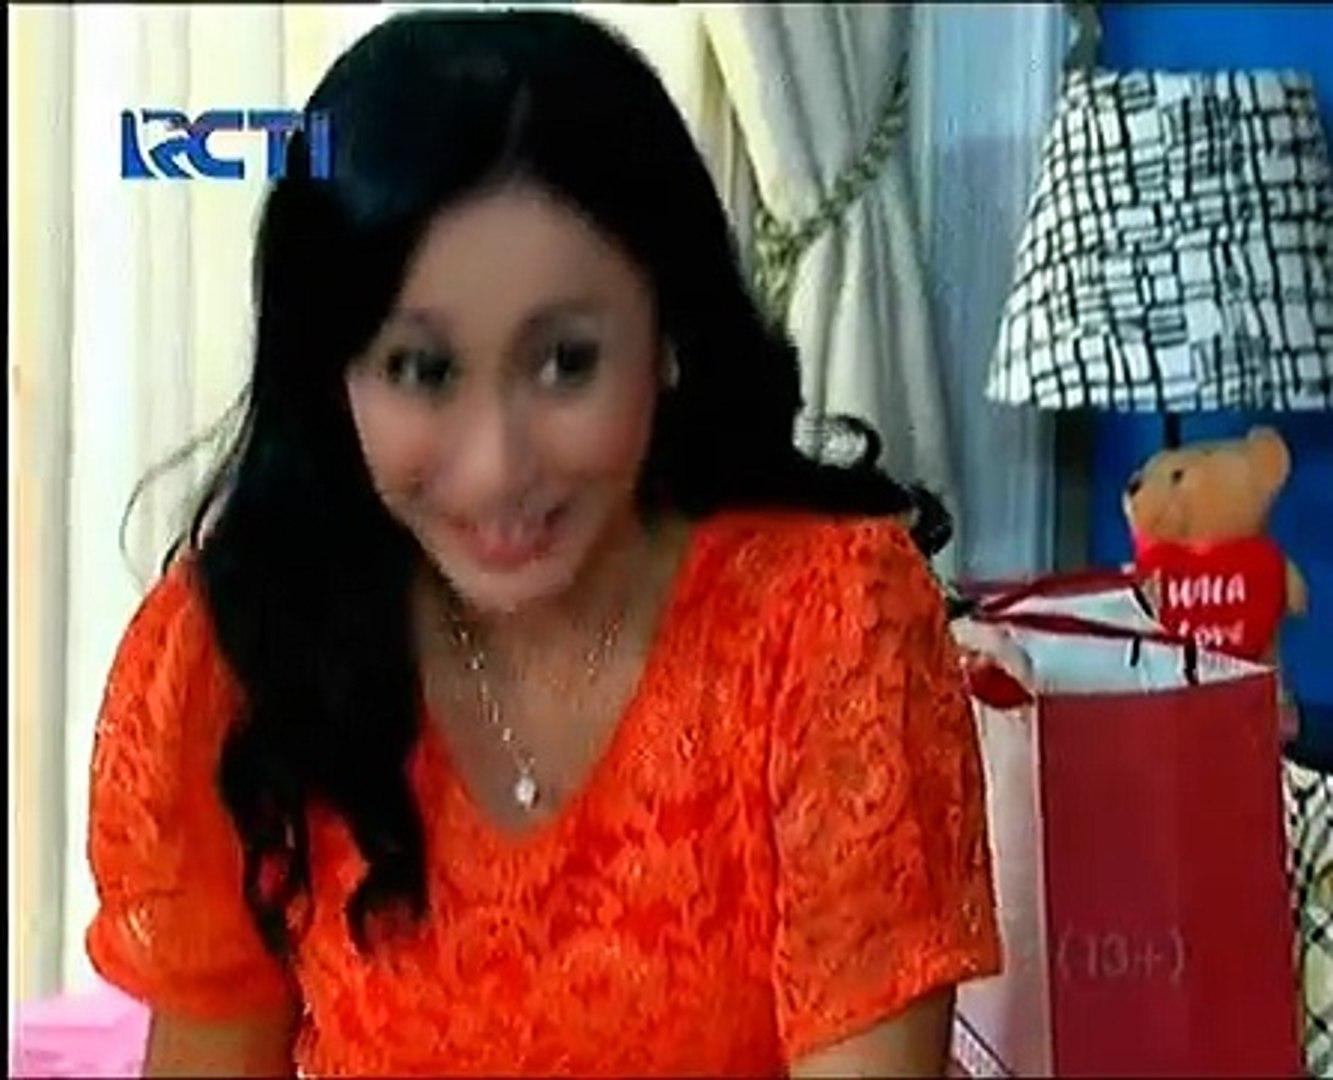 Anugerah Cinta Episode 59 60 Part 2 End